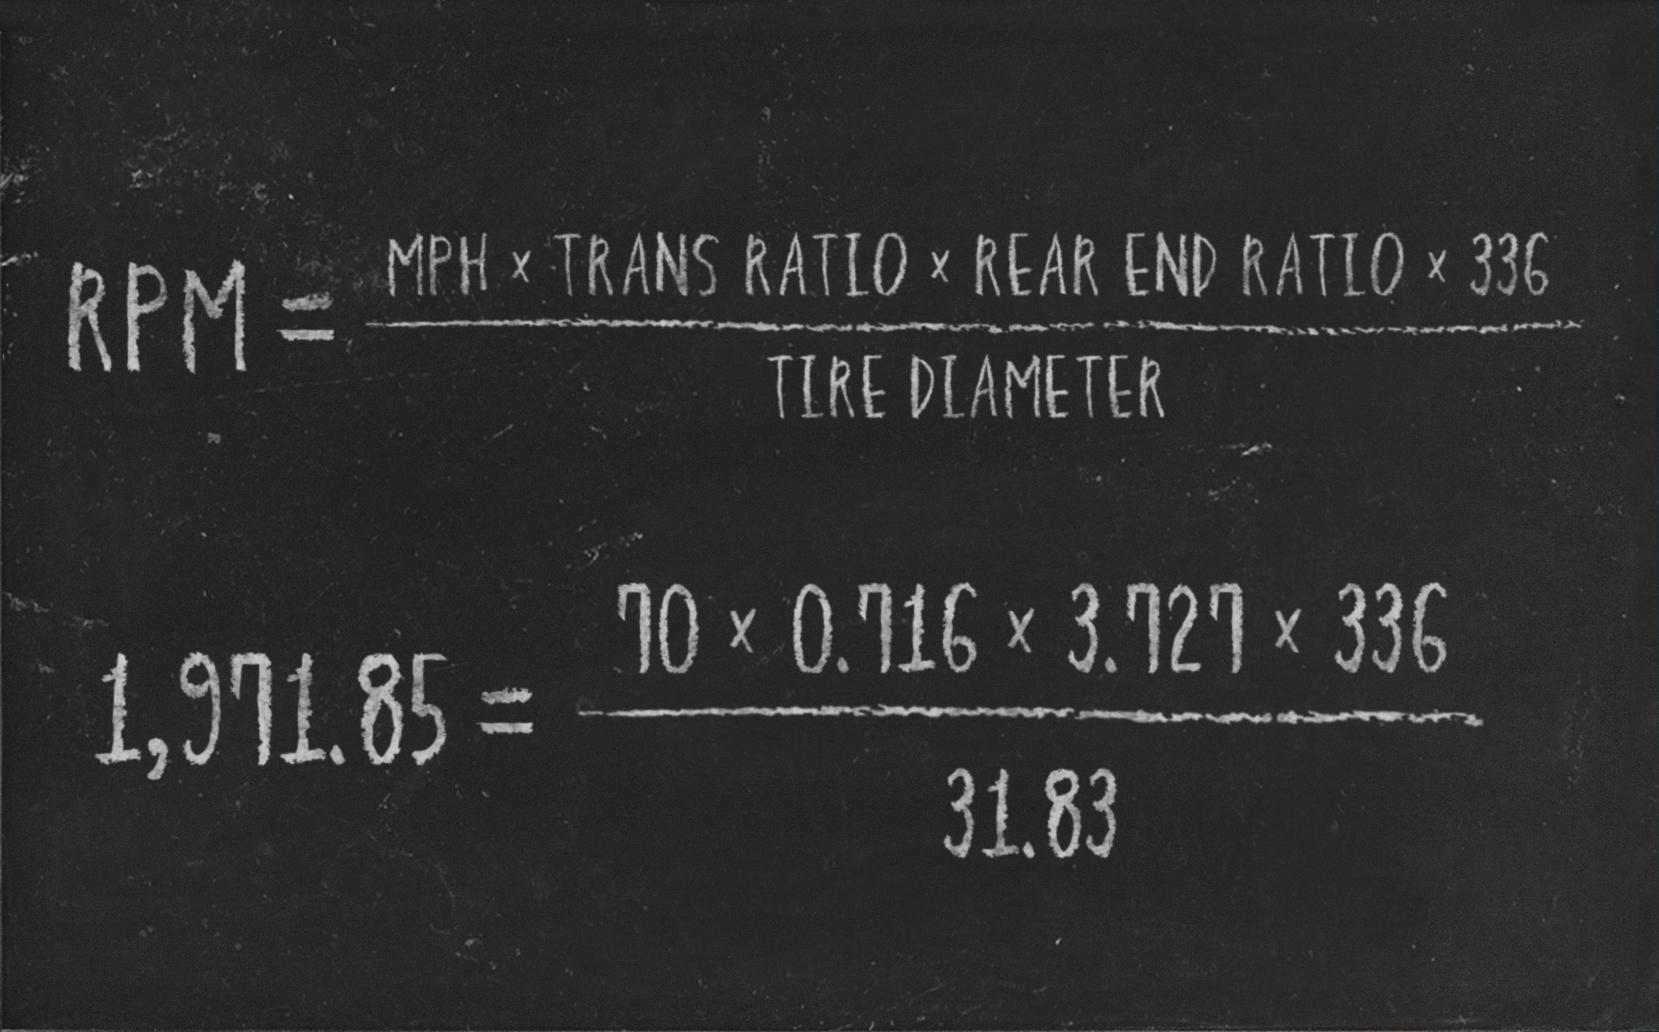 Rpmmphgear Ratio 2